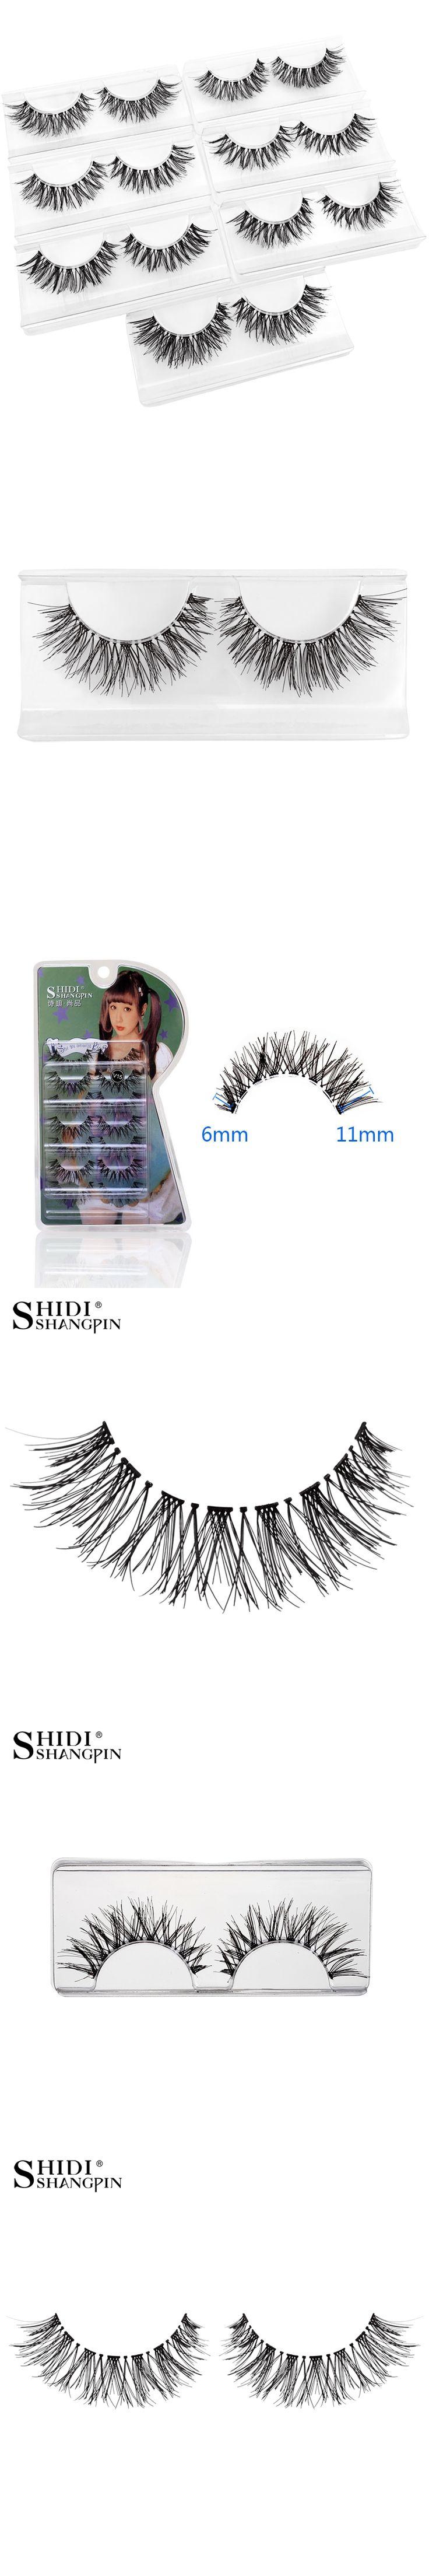 0V15# 7 pairs Natural Eyelashes Winged Handmade Makeup Fake Lashes False Eyelashes Lot Lash Extension Kit for maquiagem